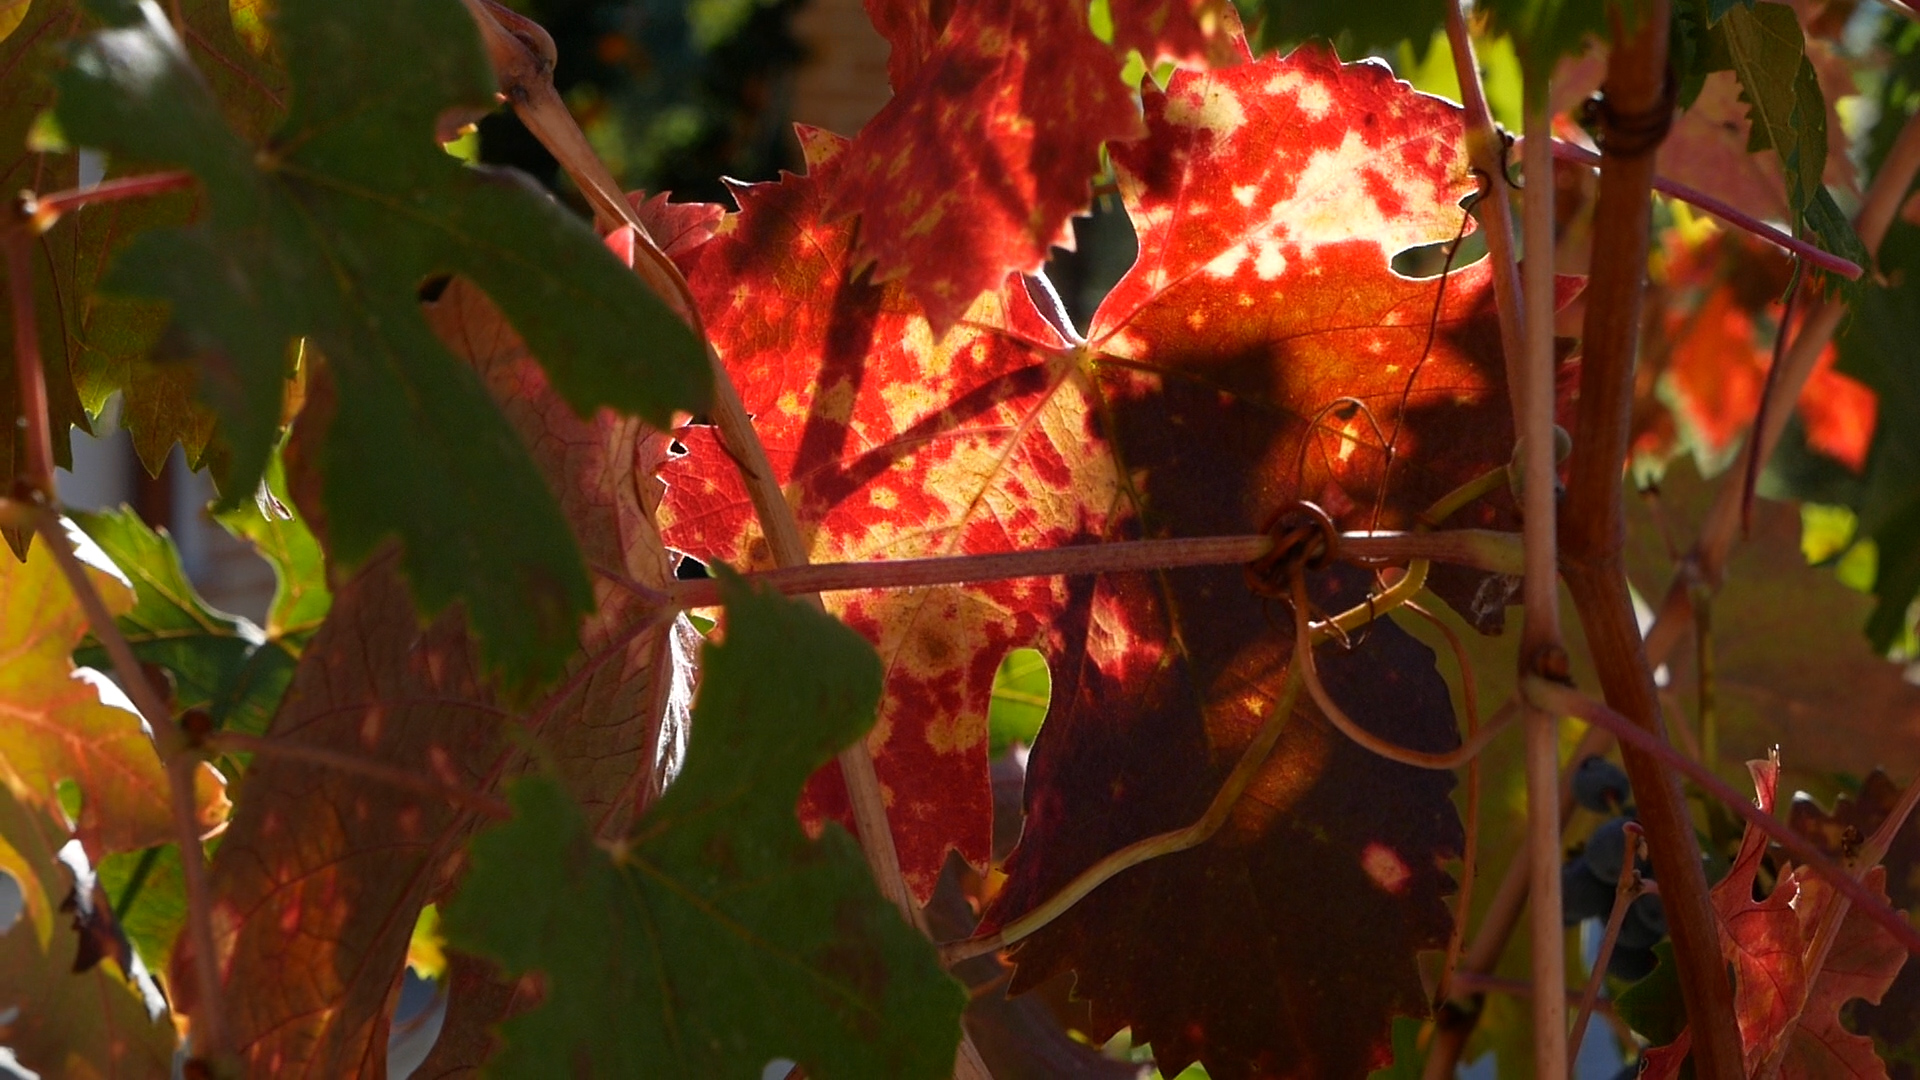 Esperienza sensoriale Assisi Tili Vini - Vendemmiamo insieme 1